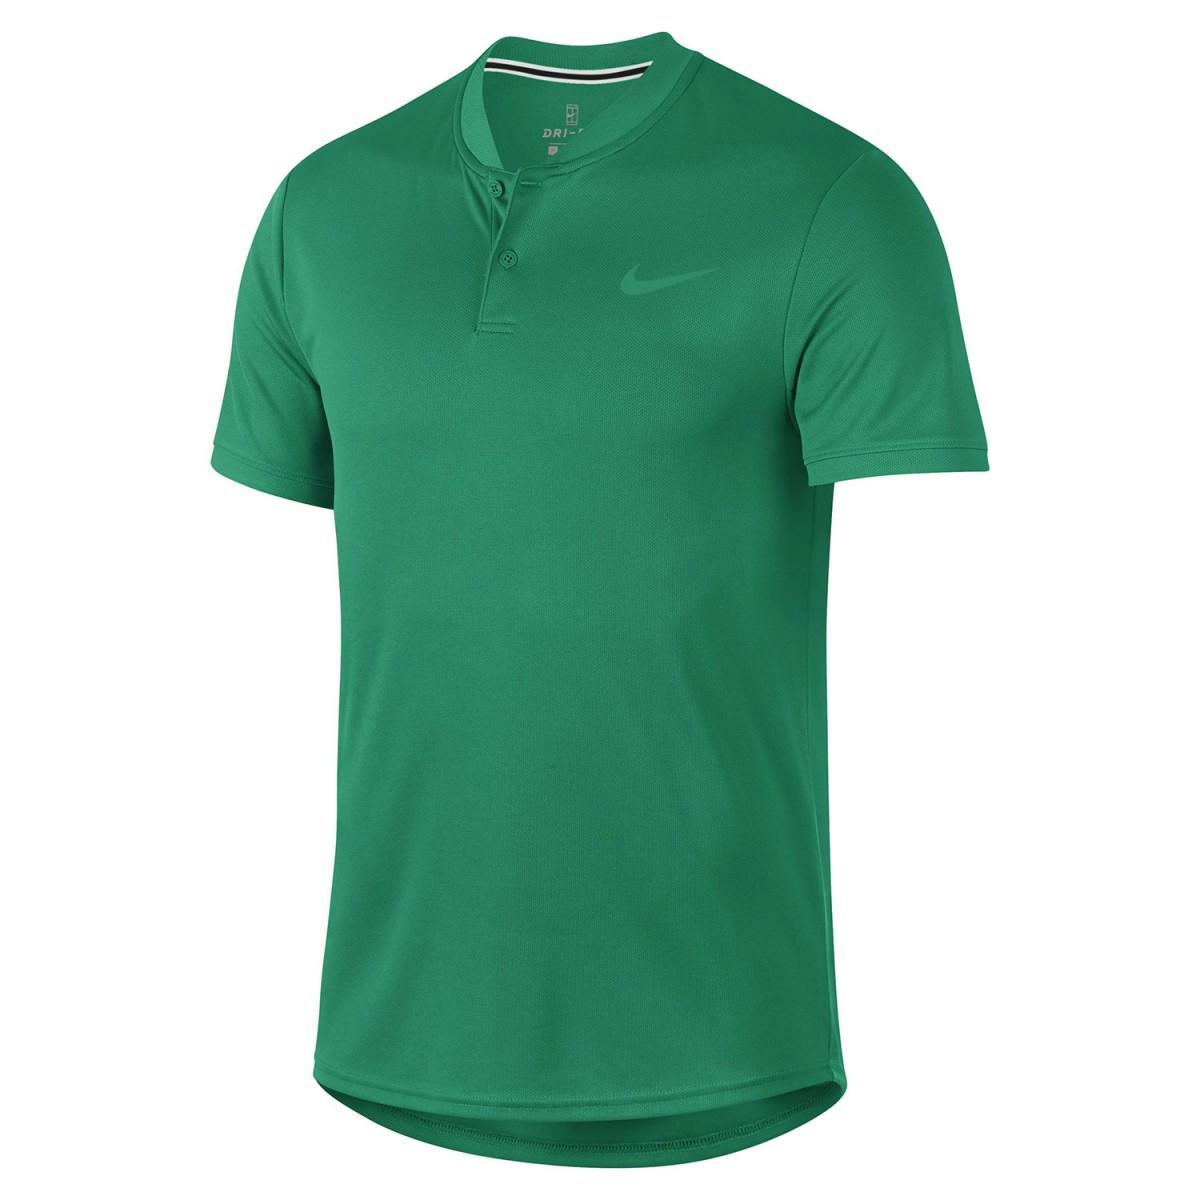 5405526a Теннисная футболка мужская Nike Court Dry Blade Polo canyon gold ...